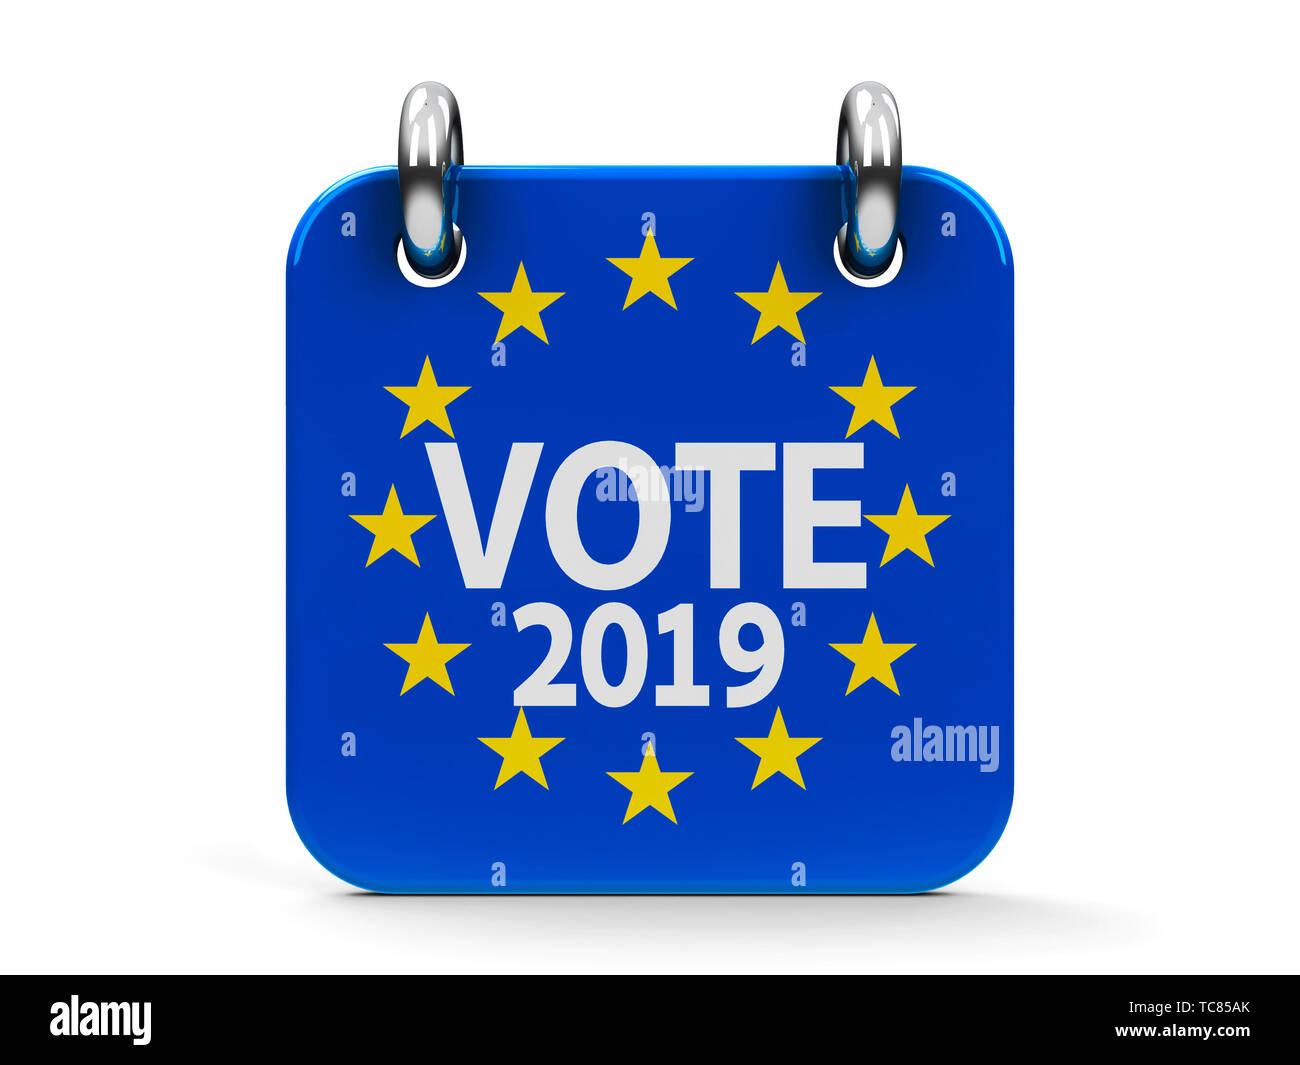 Vote election 2019 calendar icon as european union flag - represents the European Parliament election 2019, three-dimensional rendering, 3D illustrati - Stock Image